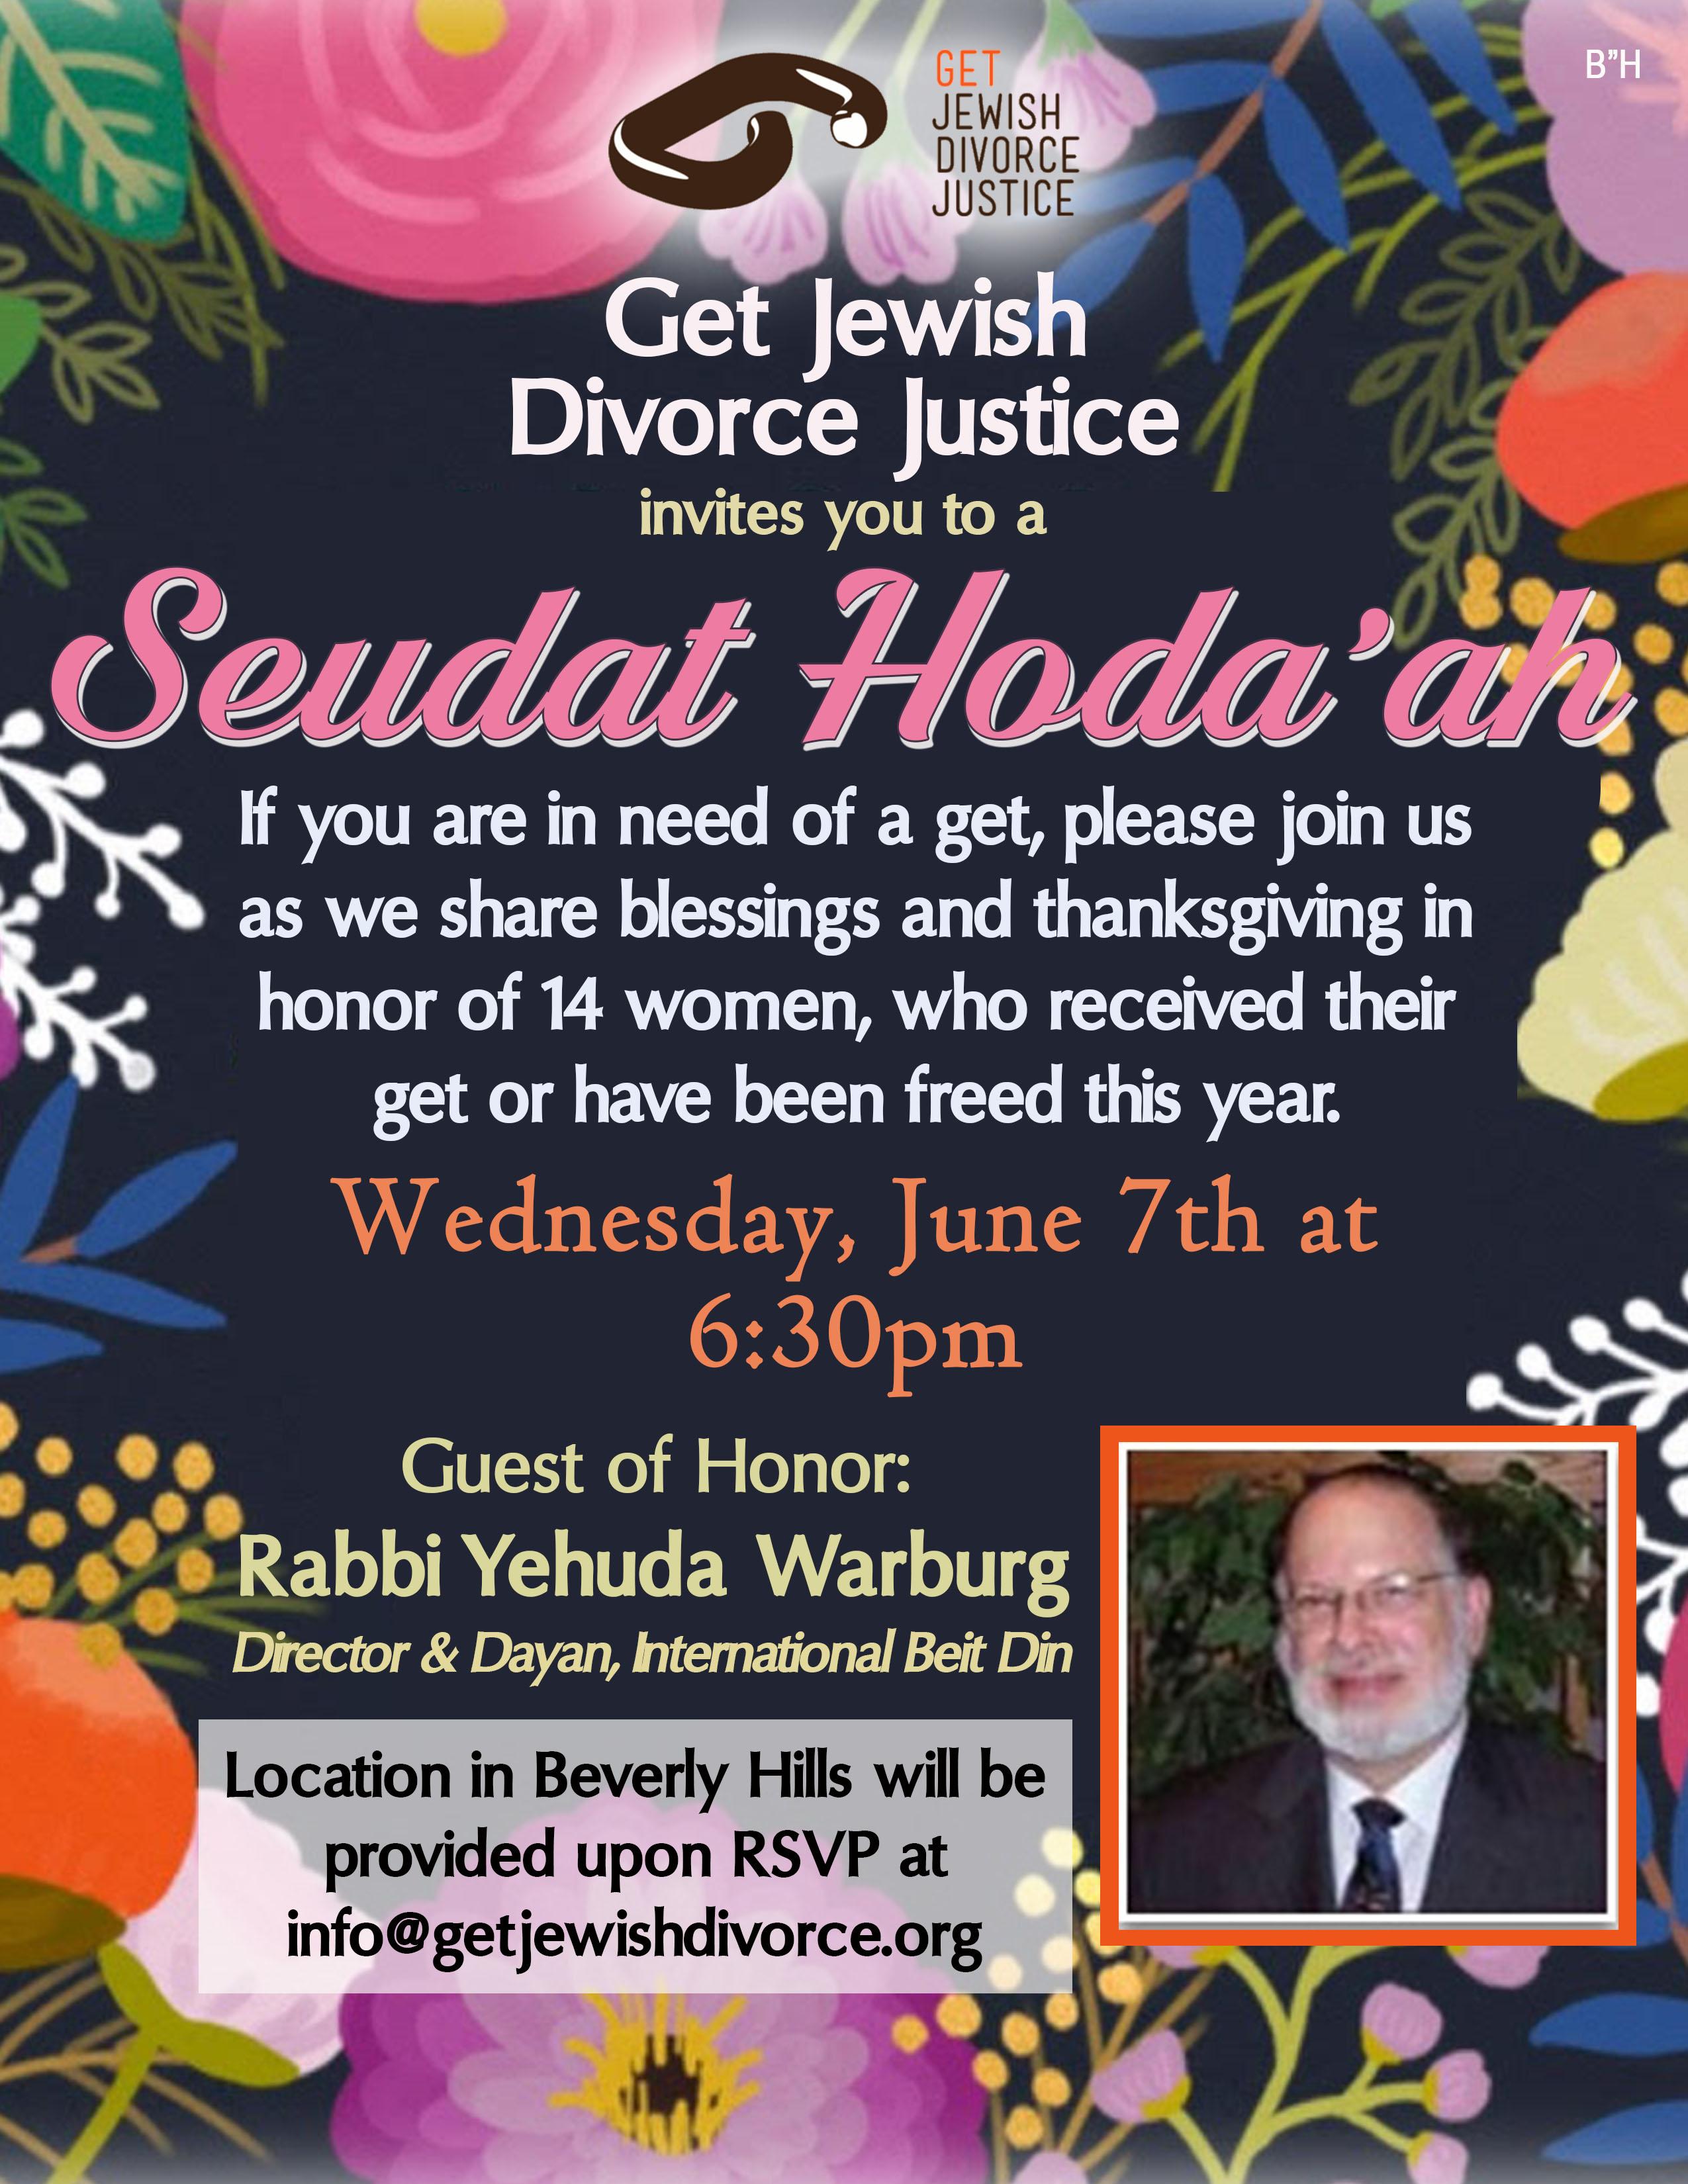 SH_for_Everyone_(no_add)-with_Rabbi_Warburg.jpg